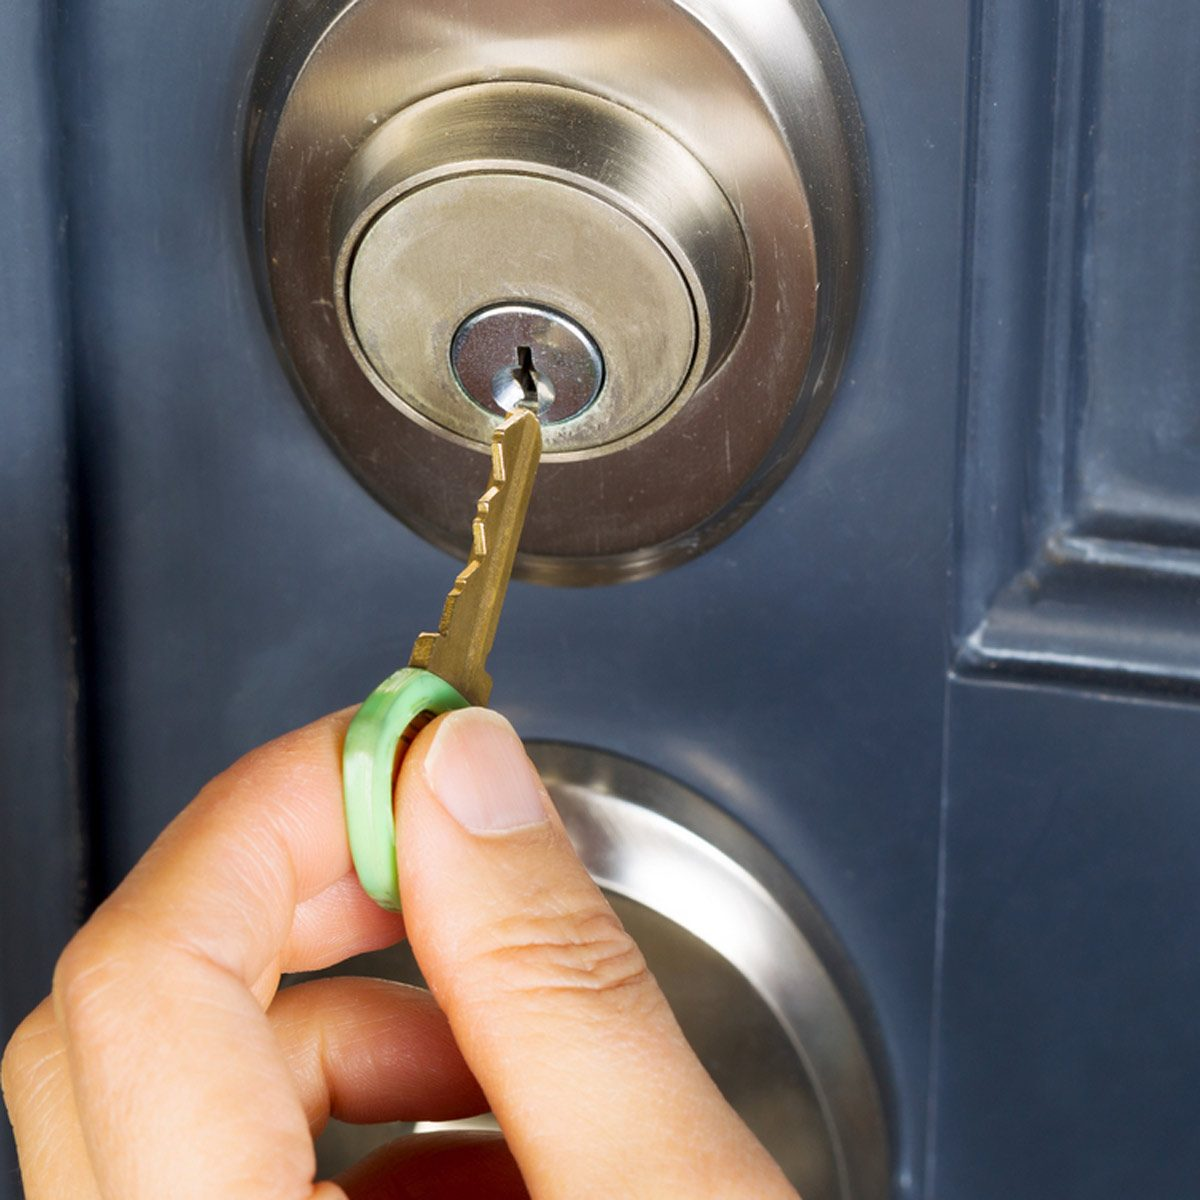 dfh17sep013_161895581 change locks key unlocking exterior door lock